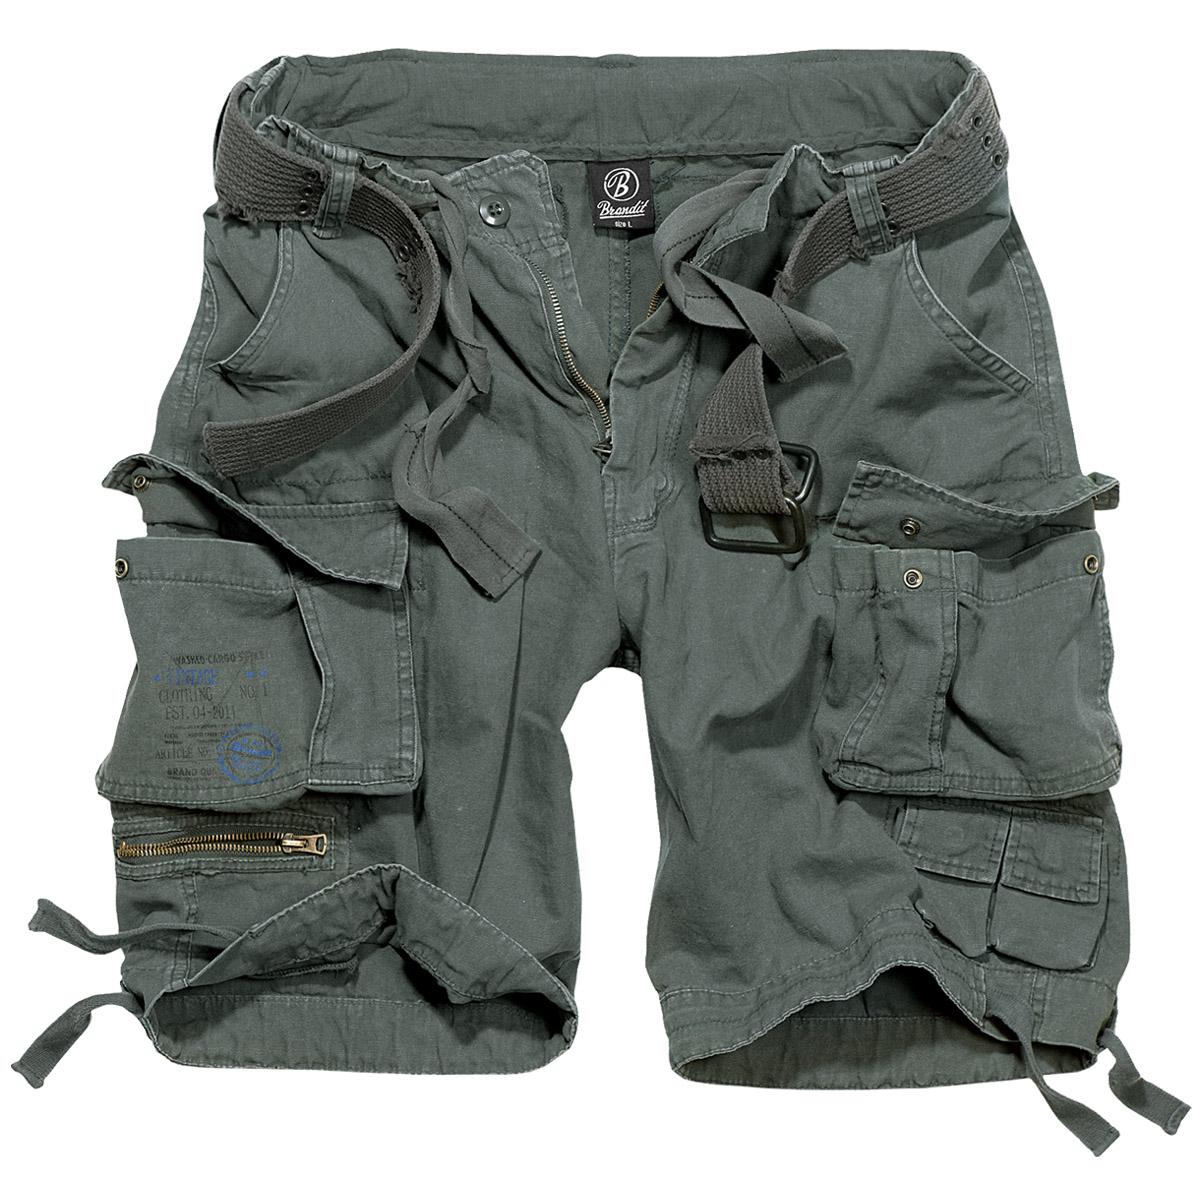 brandit savage vintage herren cargo combat shorts sommer wandern anthrazit ebay. Black Bedroom Furniture Sets. Home Design Ideas